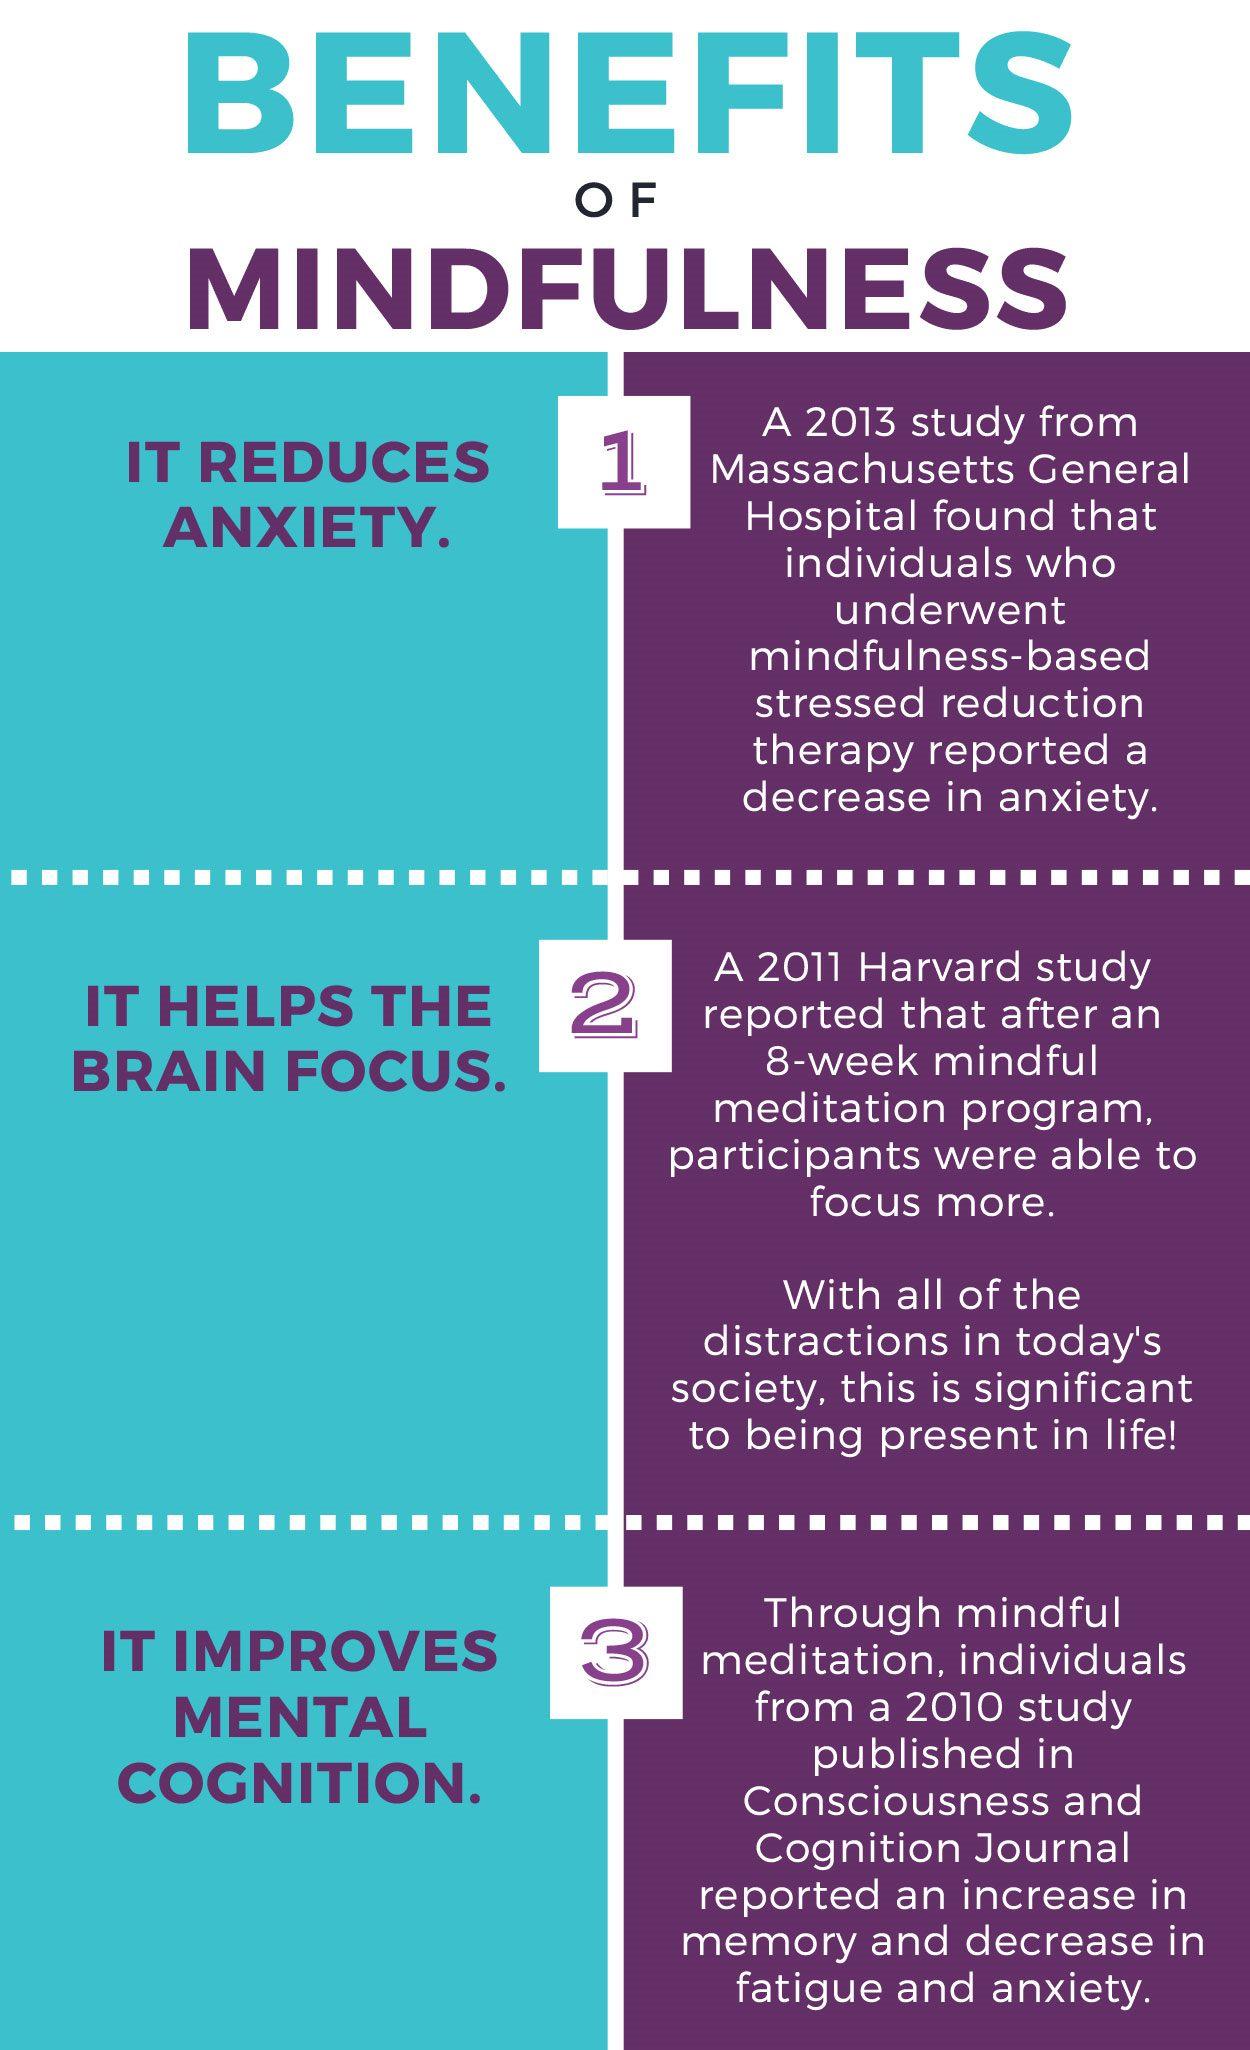 Benefits of Mindfullness Infographic